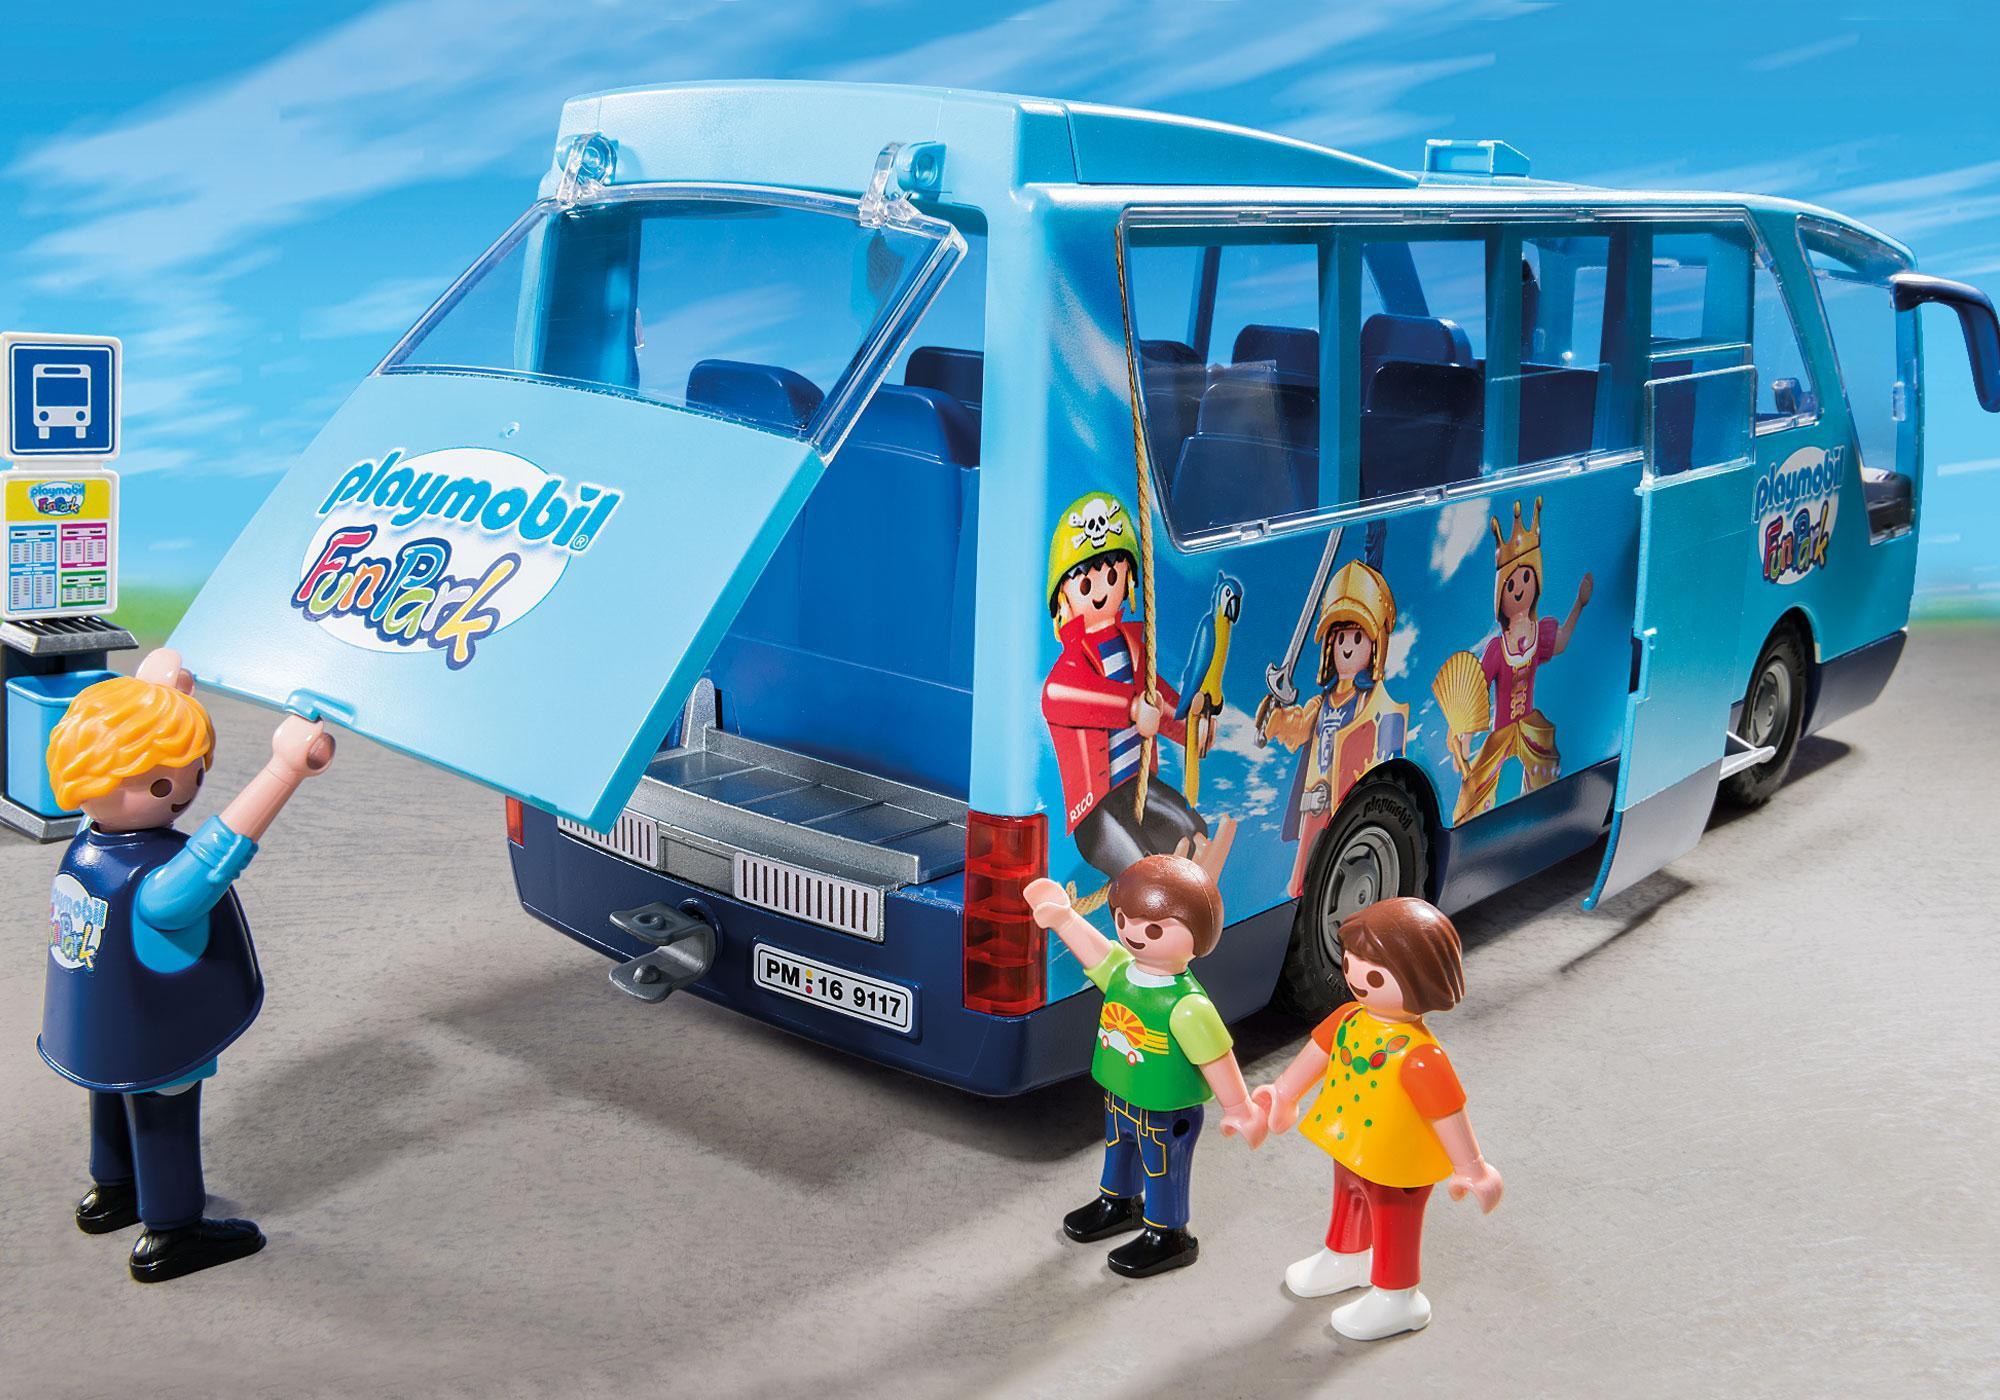 http://media.playmobil.com/i/playmobil/9117_product_extra3/PLAYMOBIL-FunPark Bus navetta